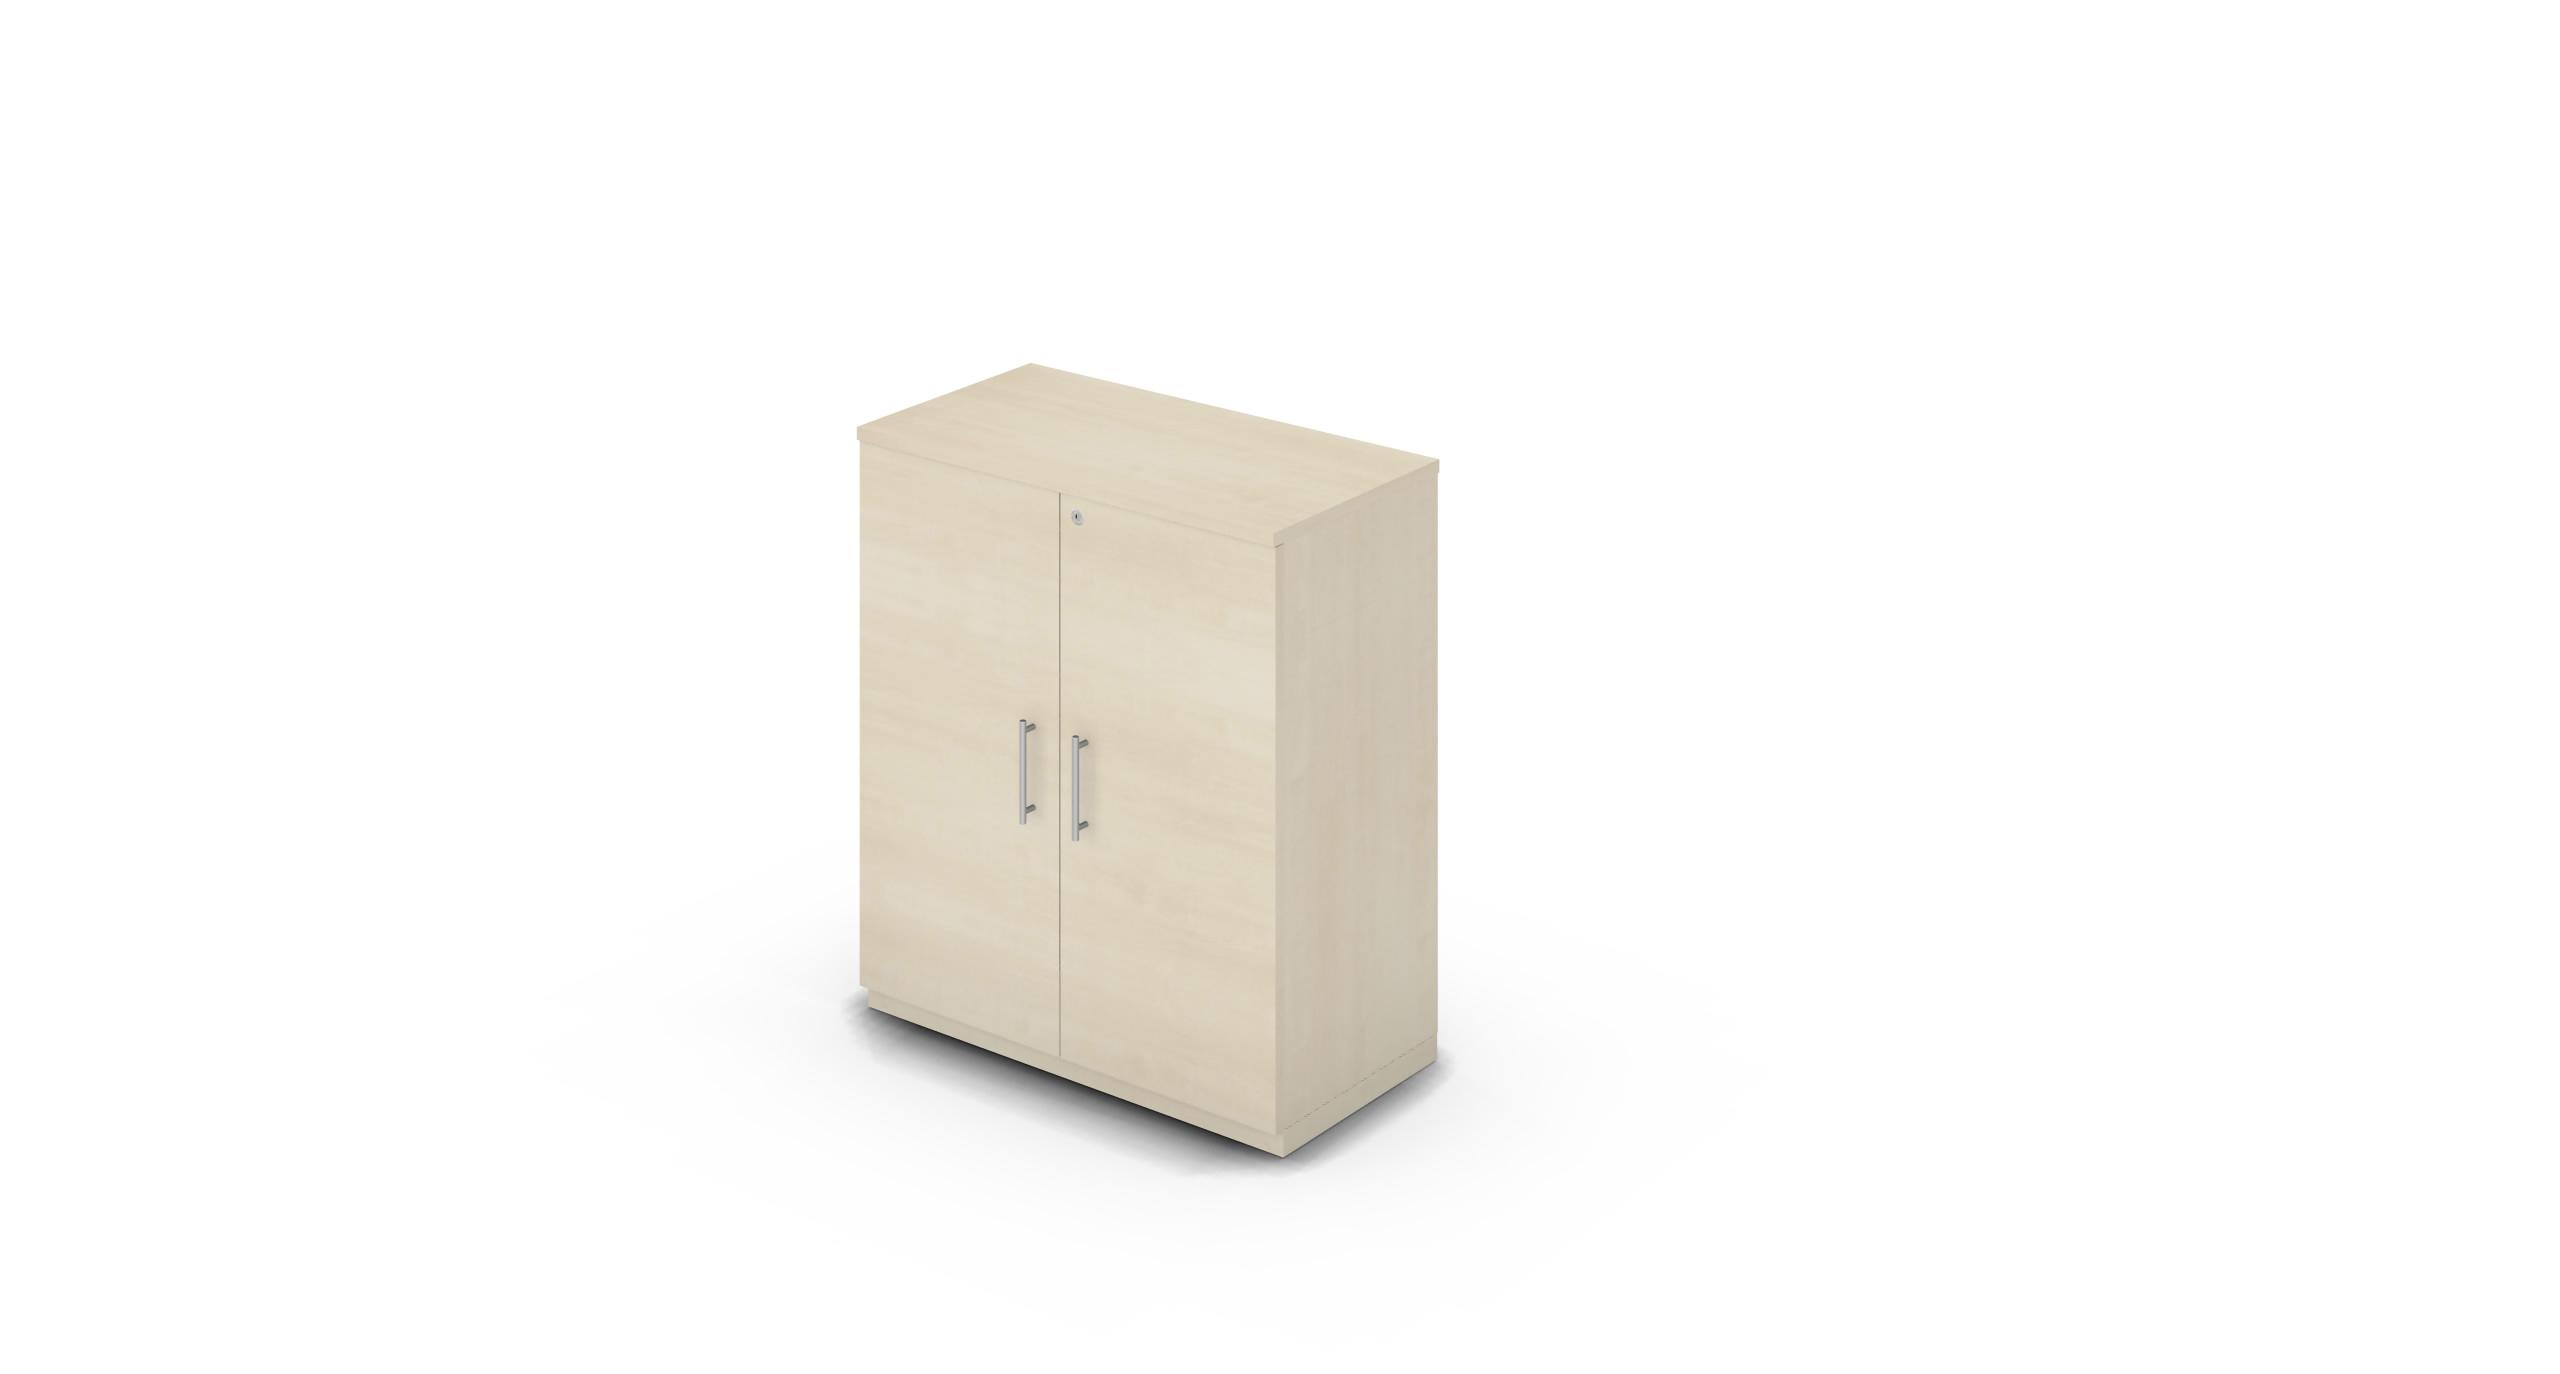 Cabinet_900x450x1125_HD_Maple_Bar_Round_WithCylinder